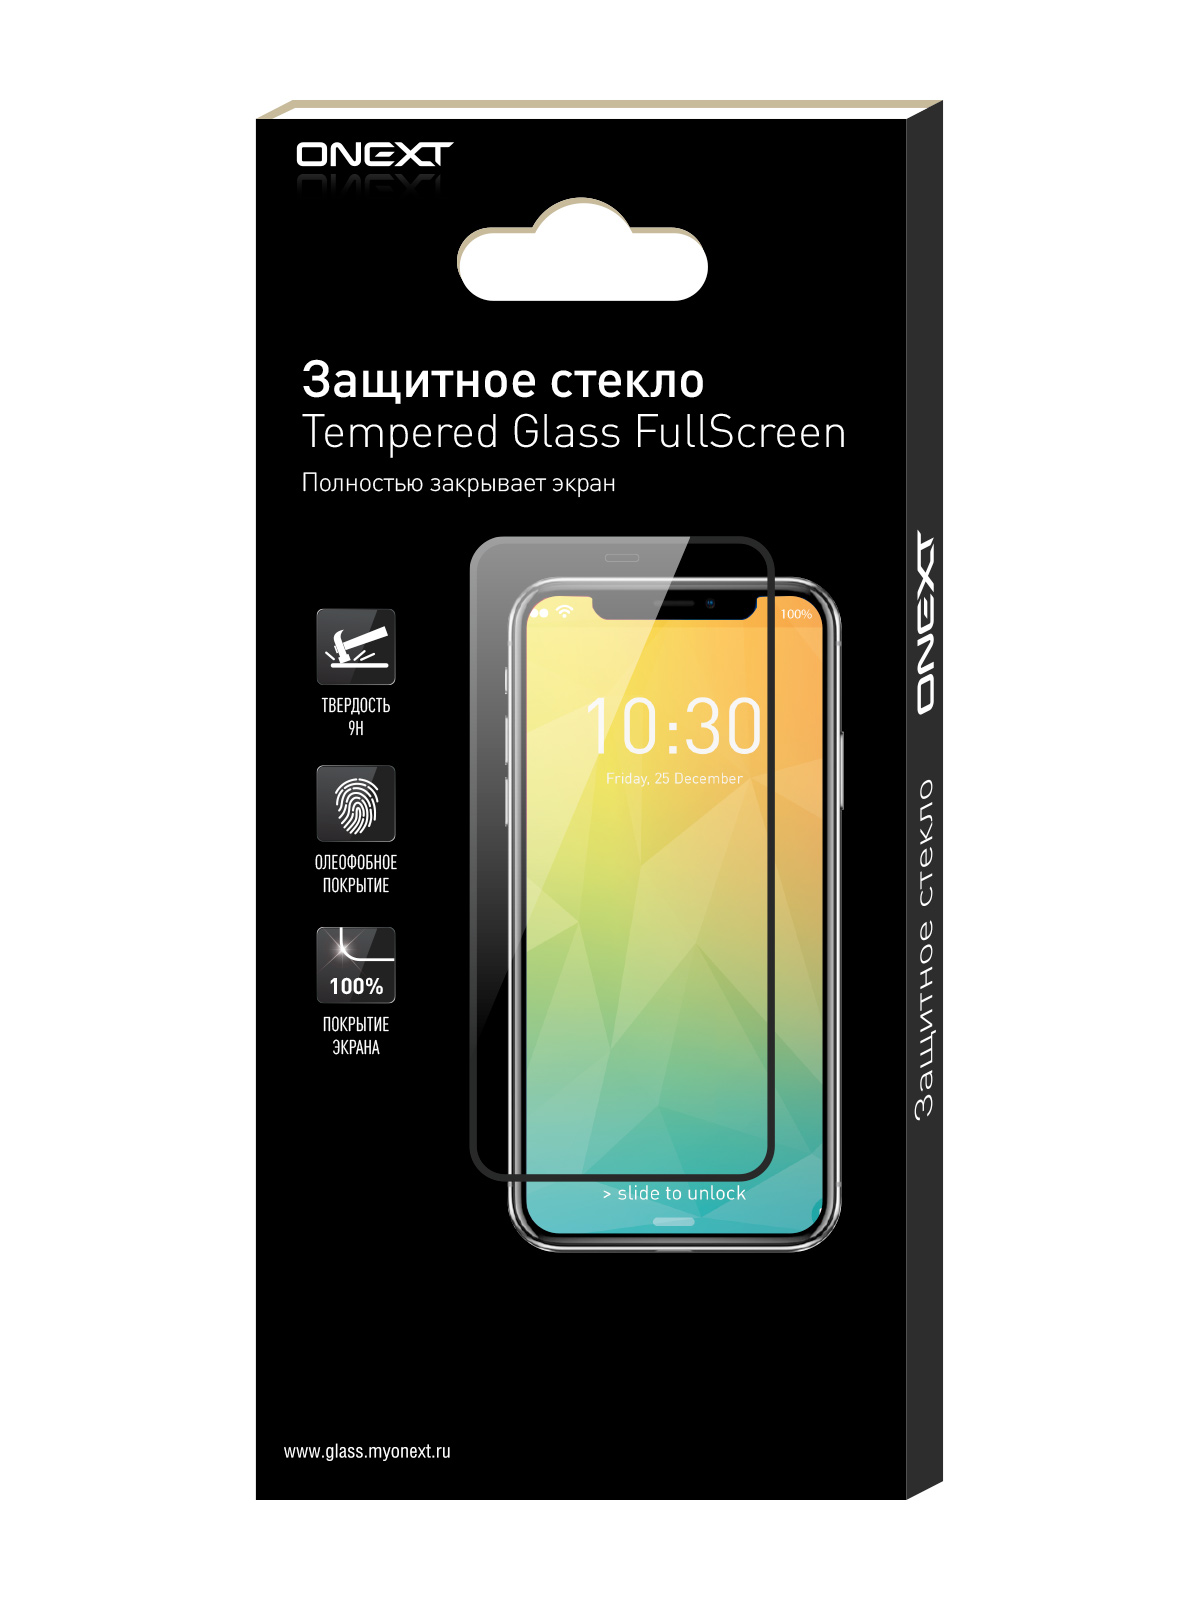 Защитное стекло ONEXT для Meizu M6S White